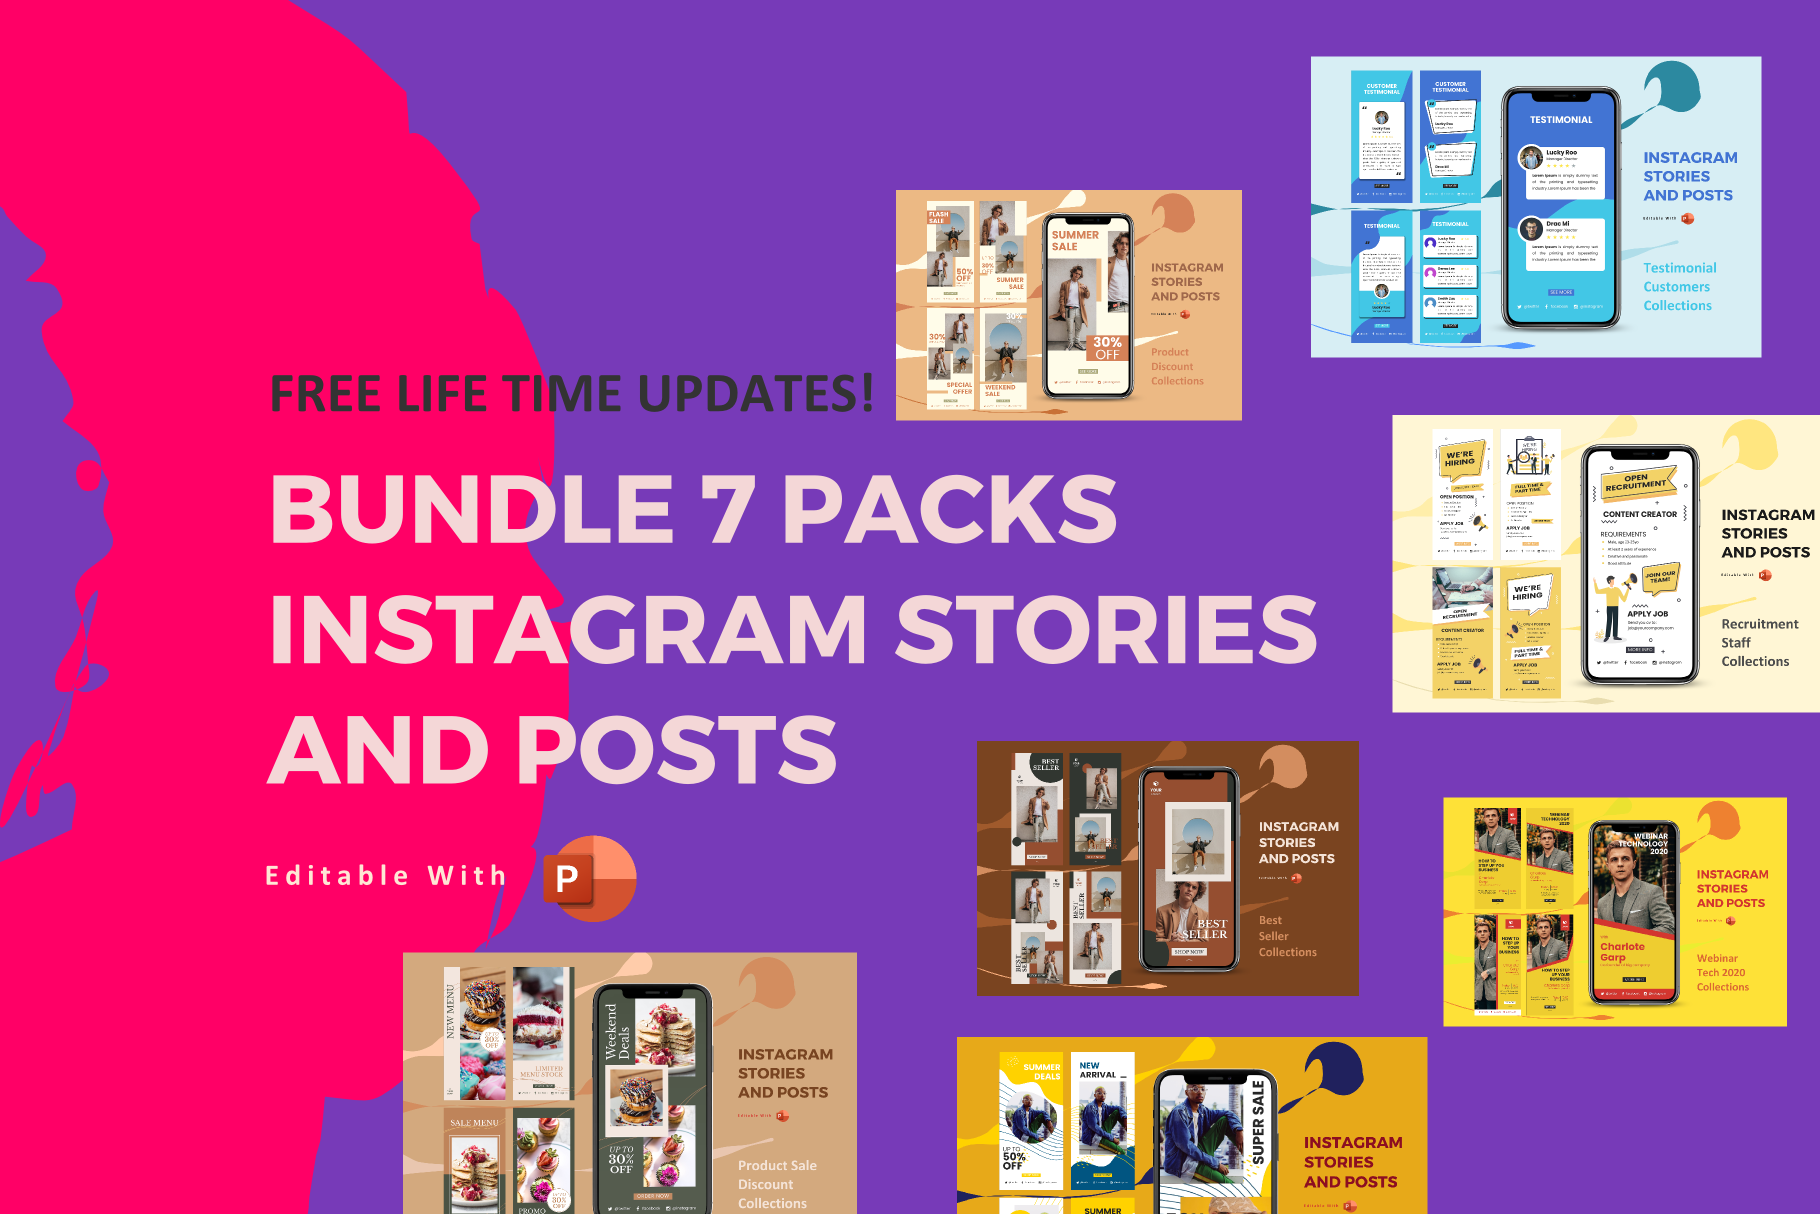 Updates Bundle 7 Packs Instagram Stories And Posts Powerpoint Template Crella